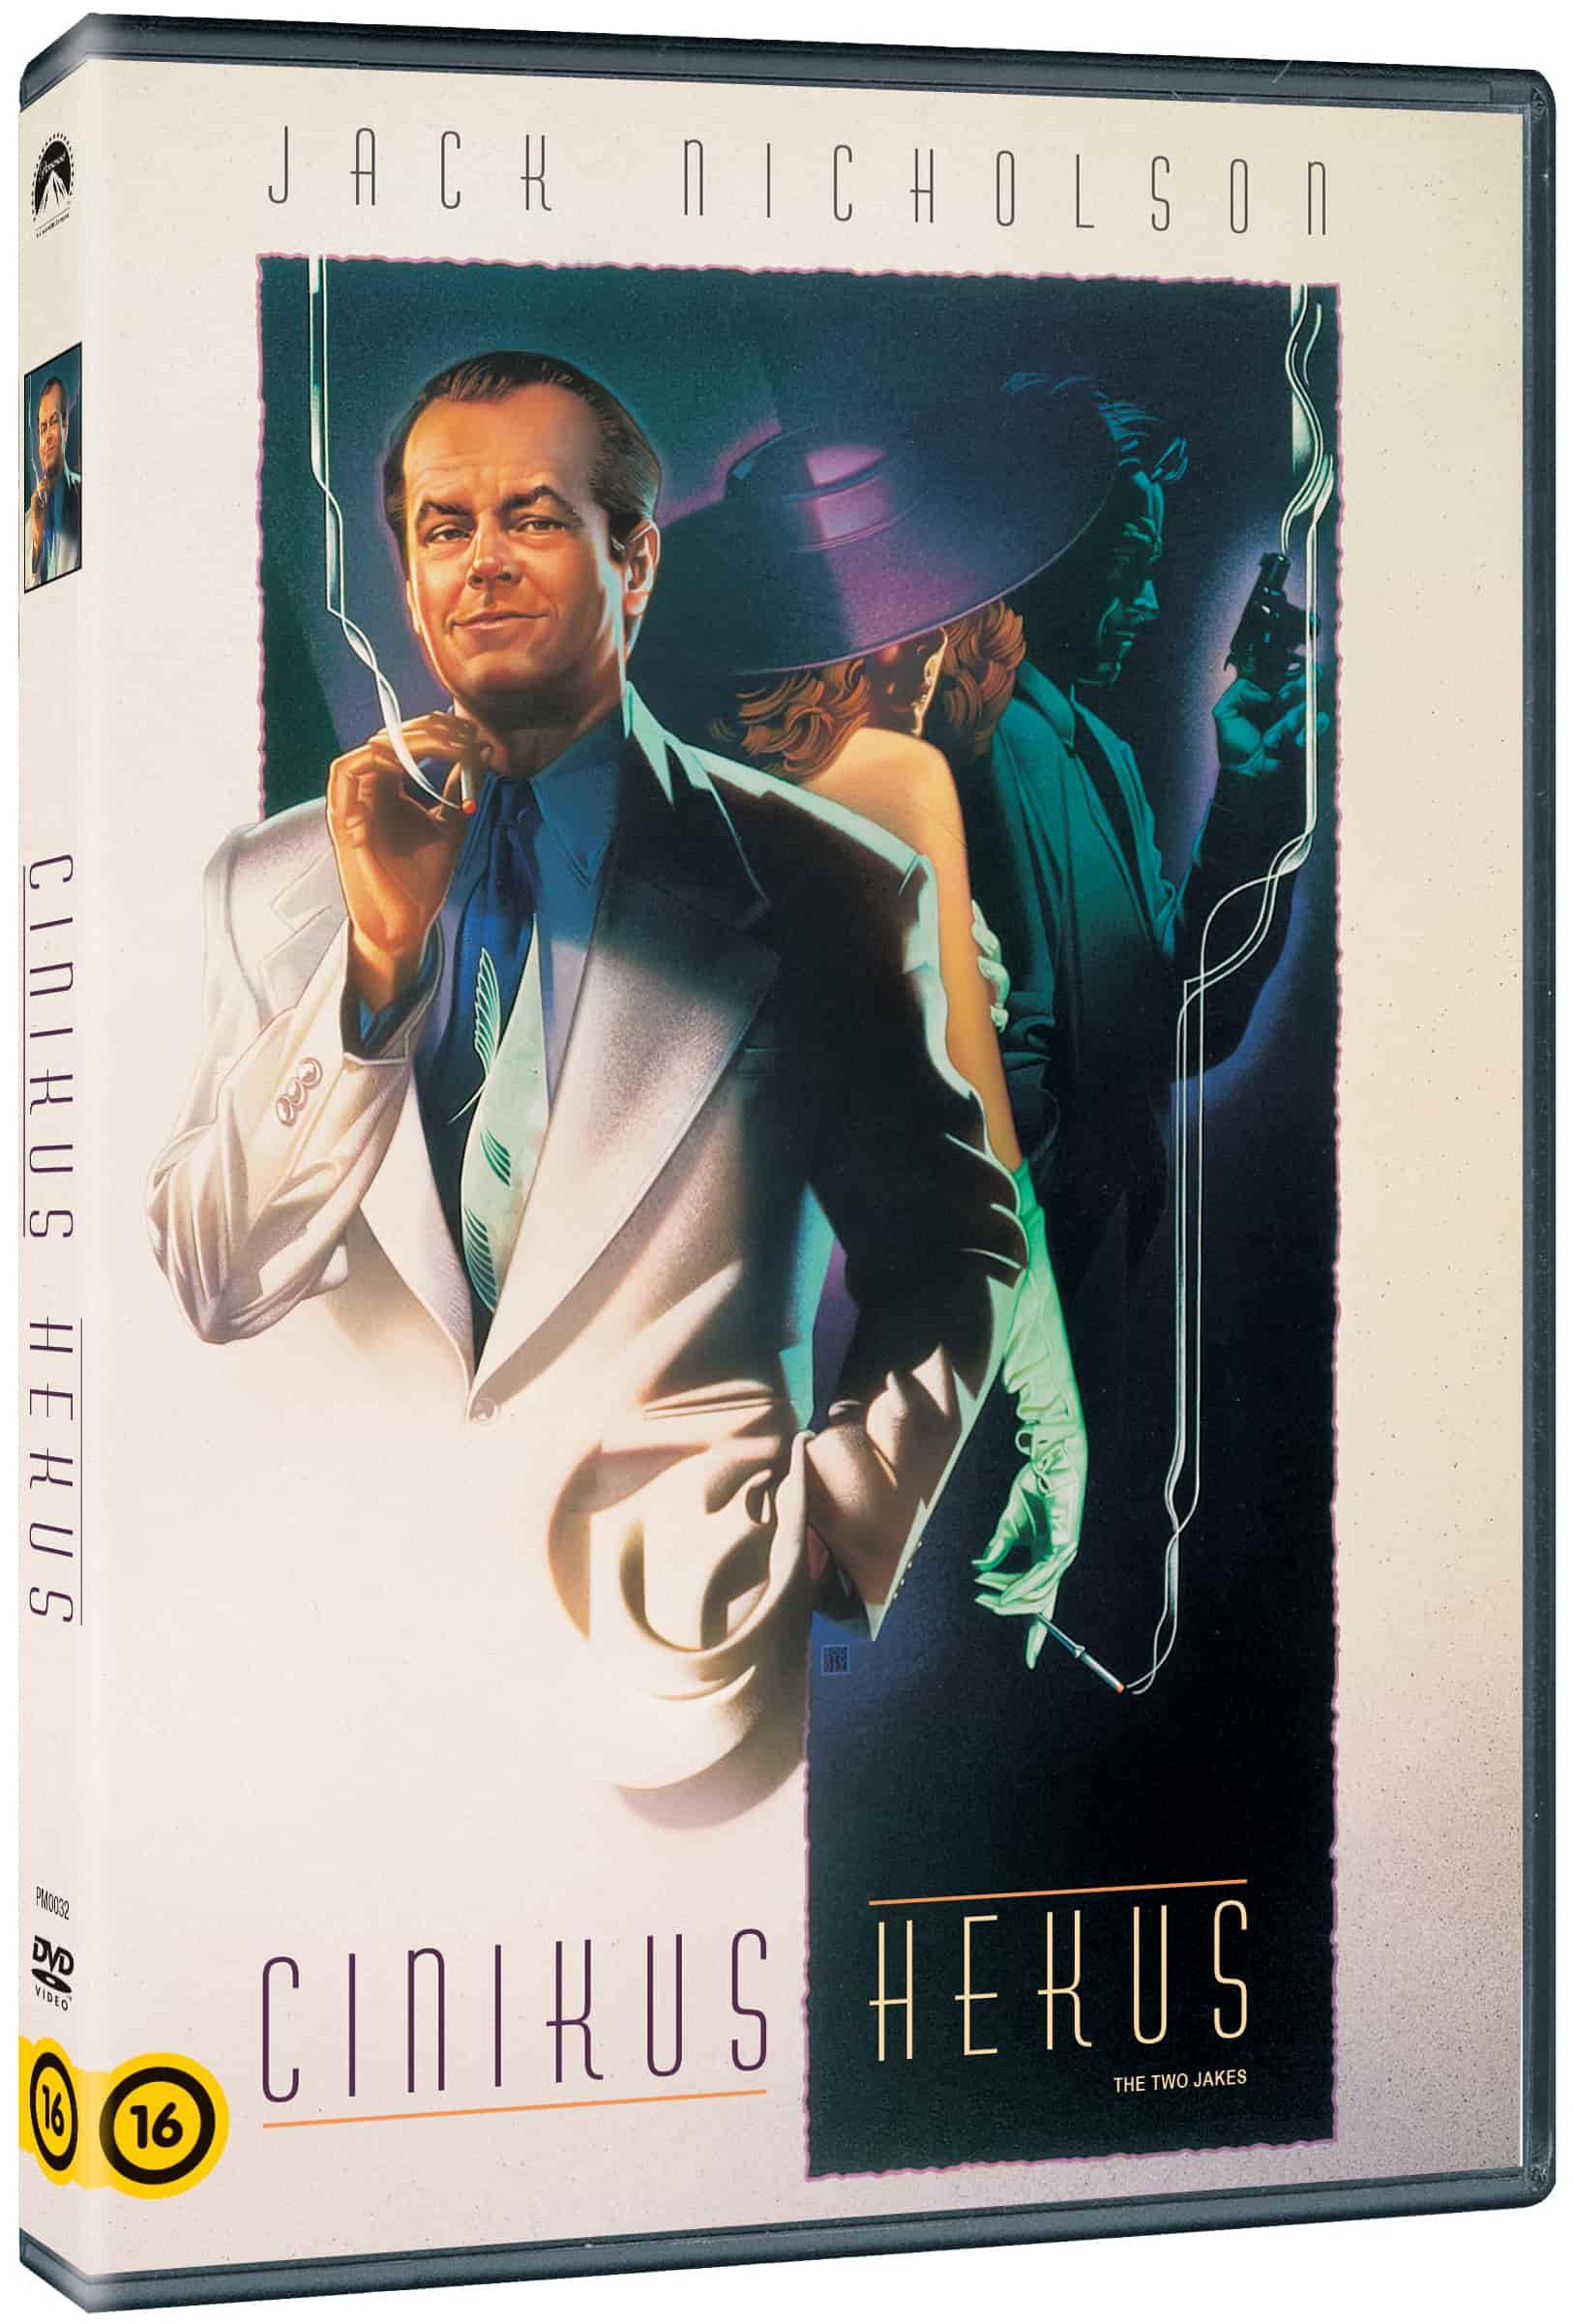 Cinikus hekus - DVD